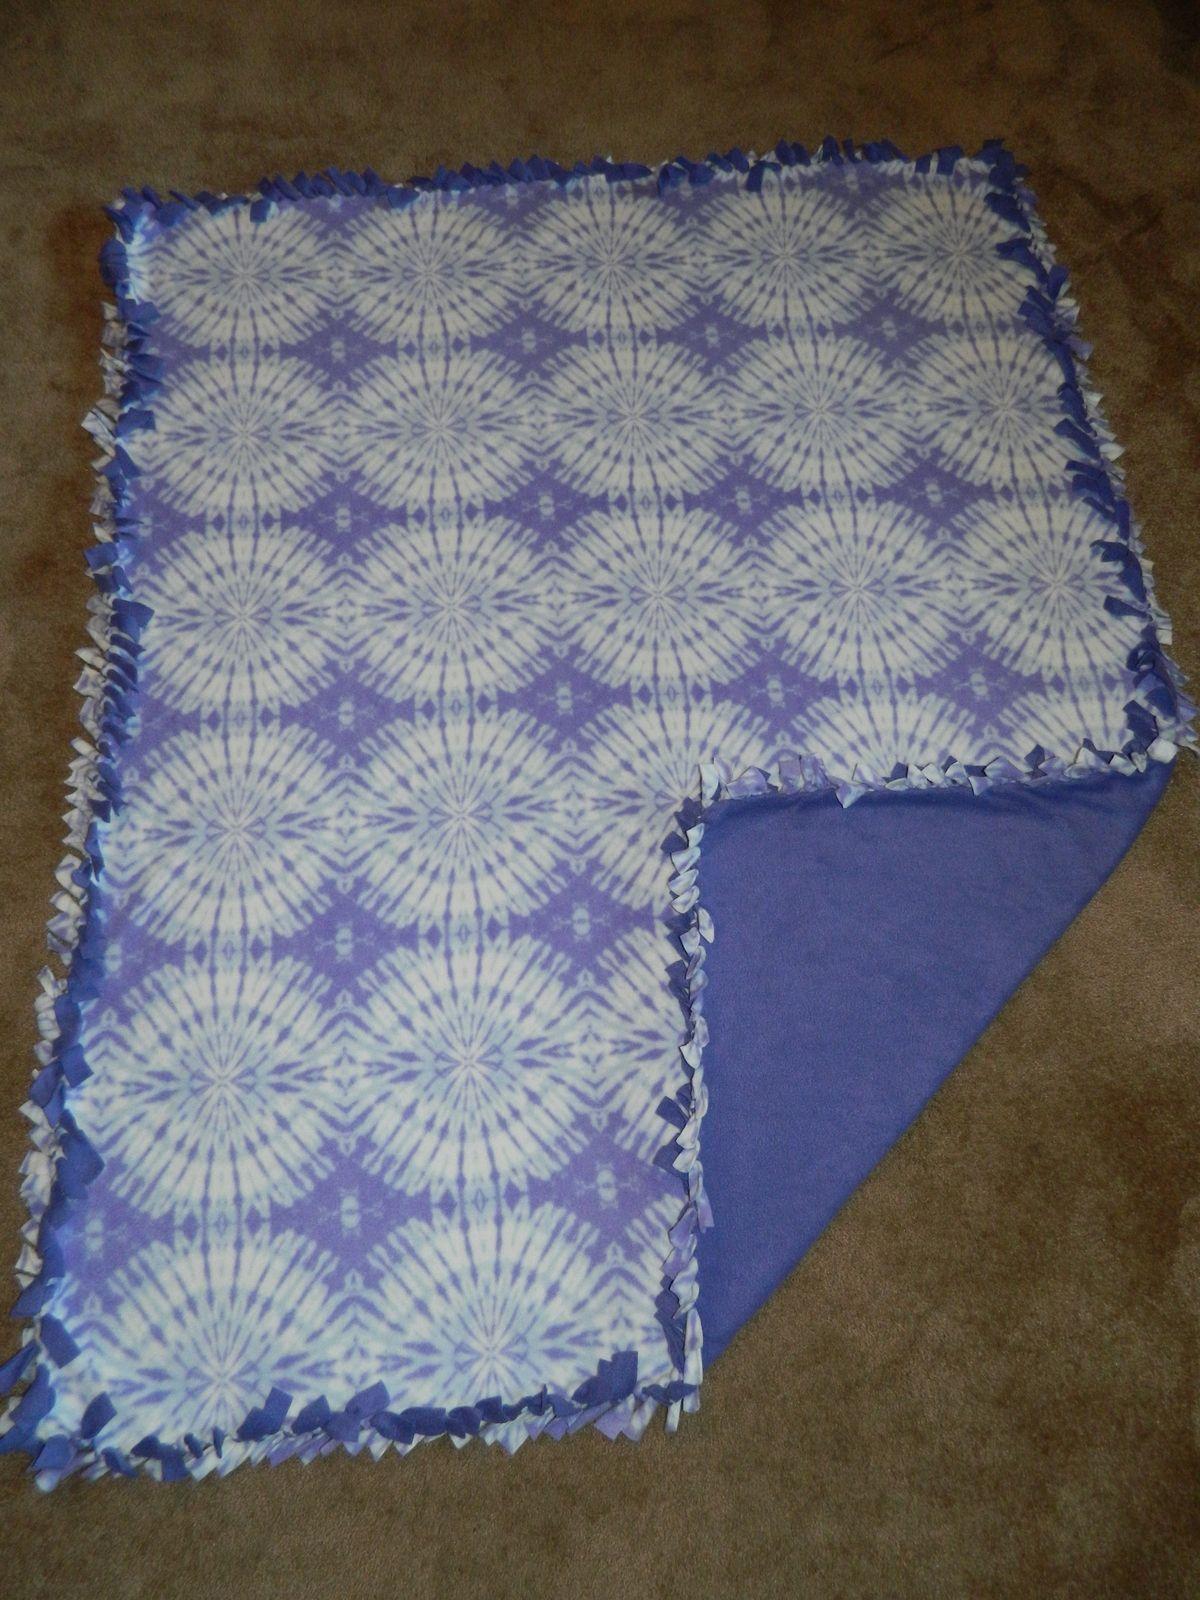 Pin by robyn murray on handmade by erinn pinterest tie dye